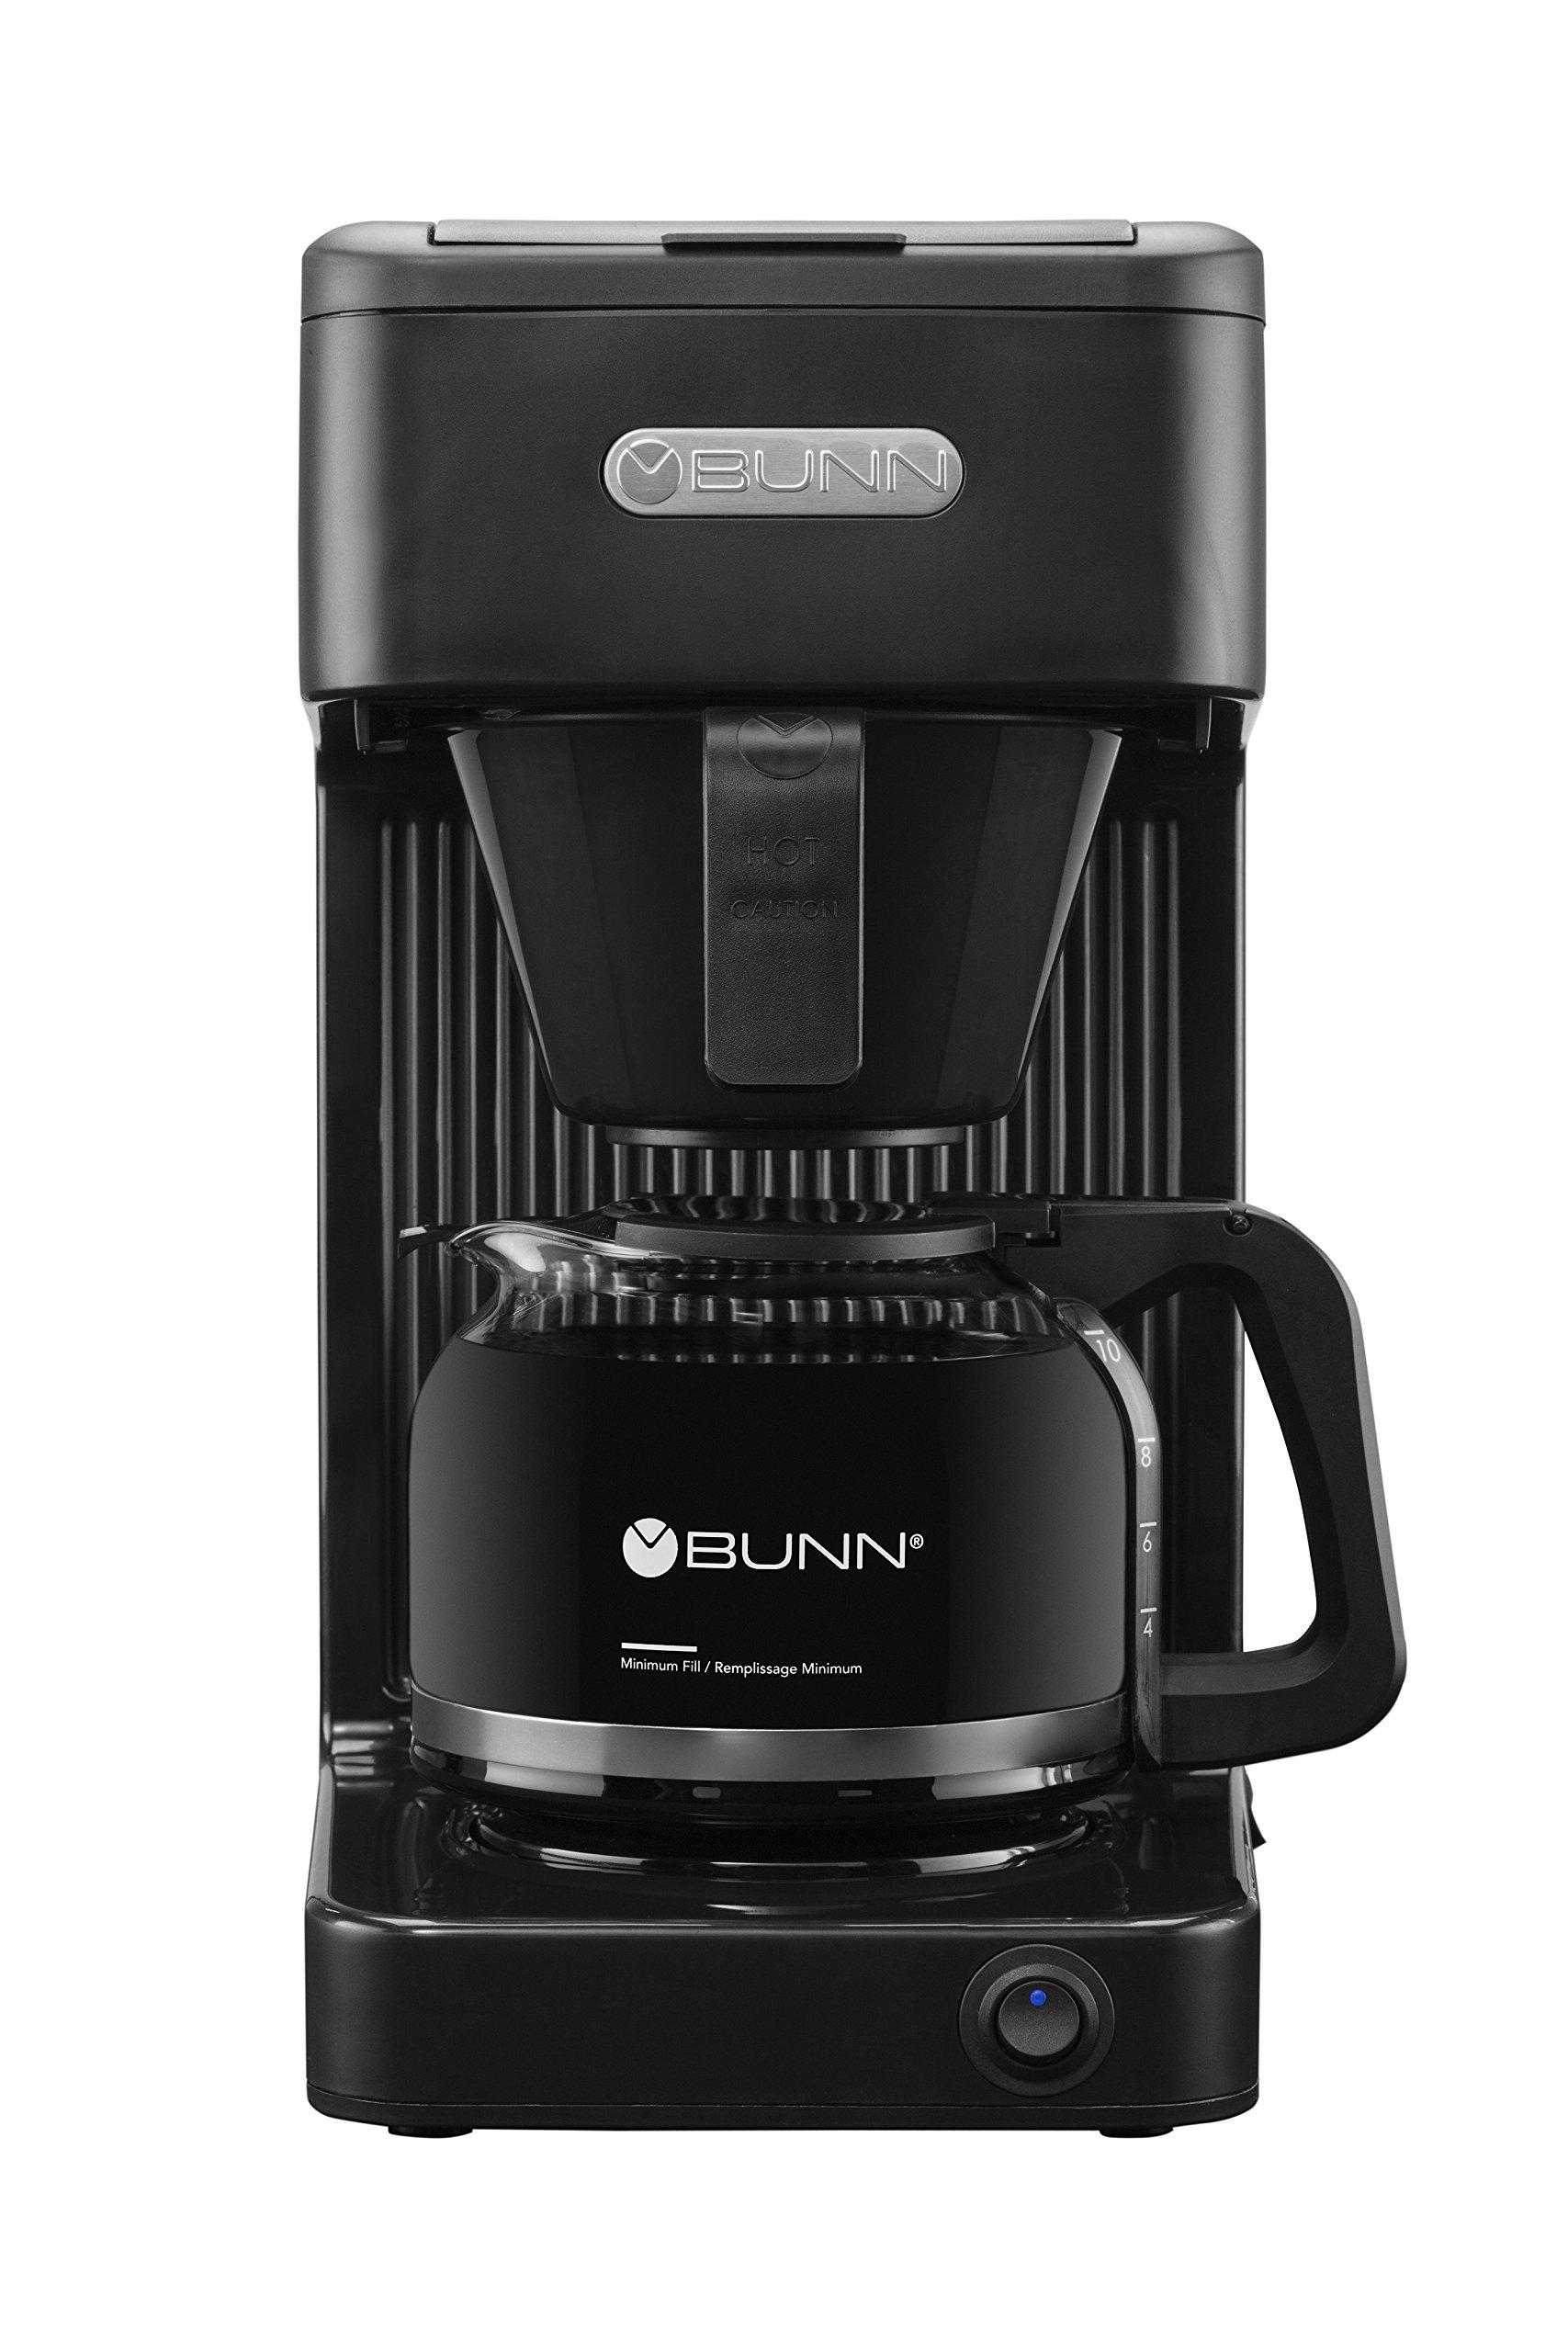 BUNN-O-MATIC CSB1 Speed Brew Select Bunn 10C Brewer Coffee Maker, 10-Cup, Black by BUNN-O-MATIC